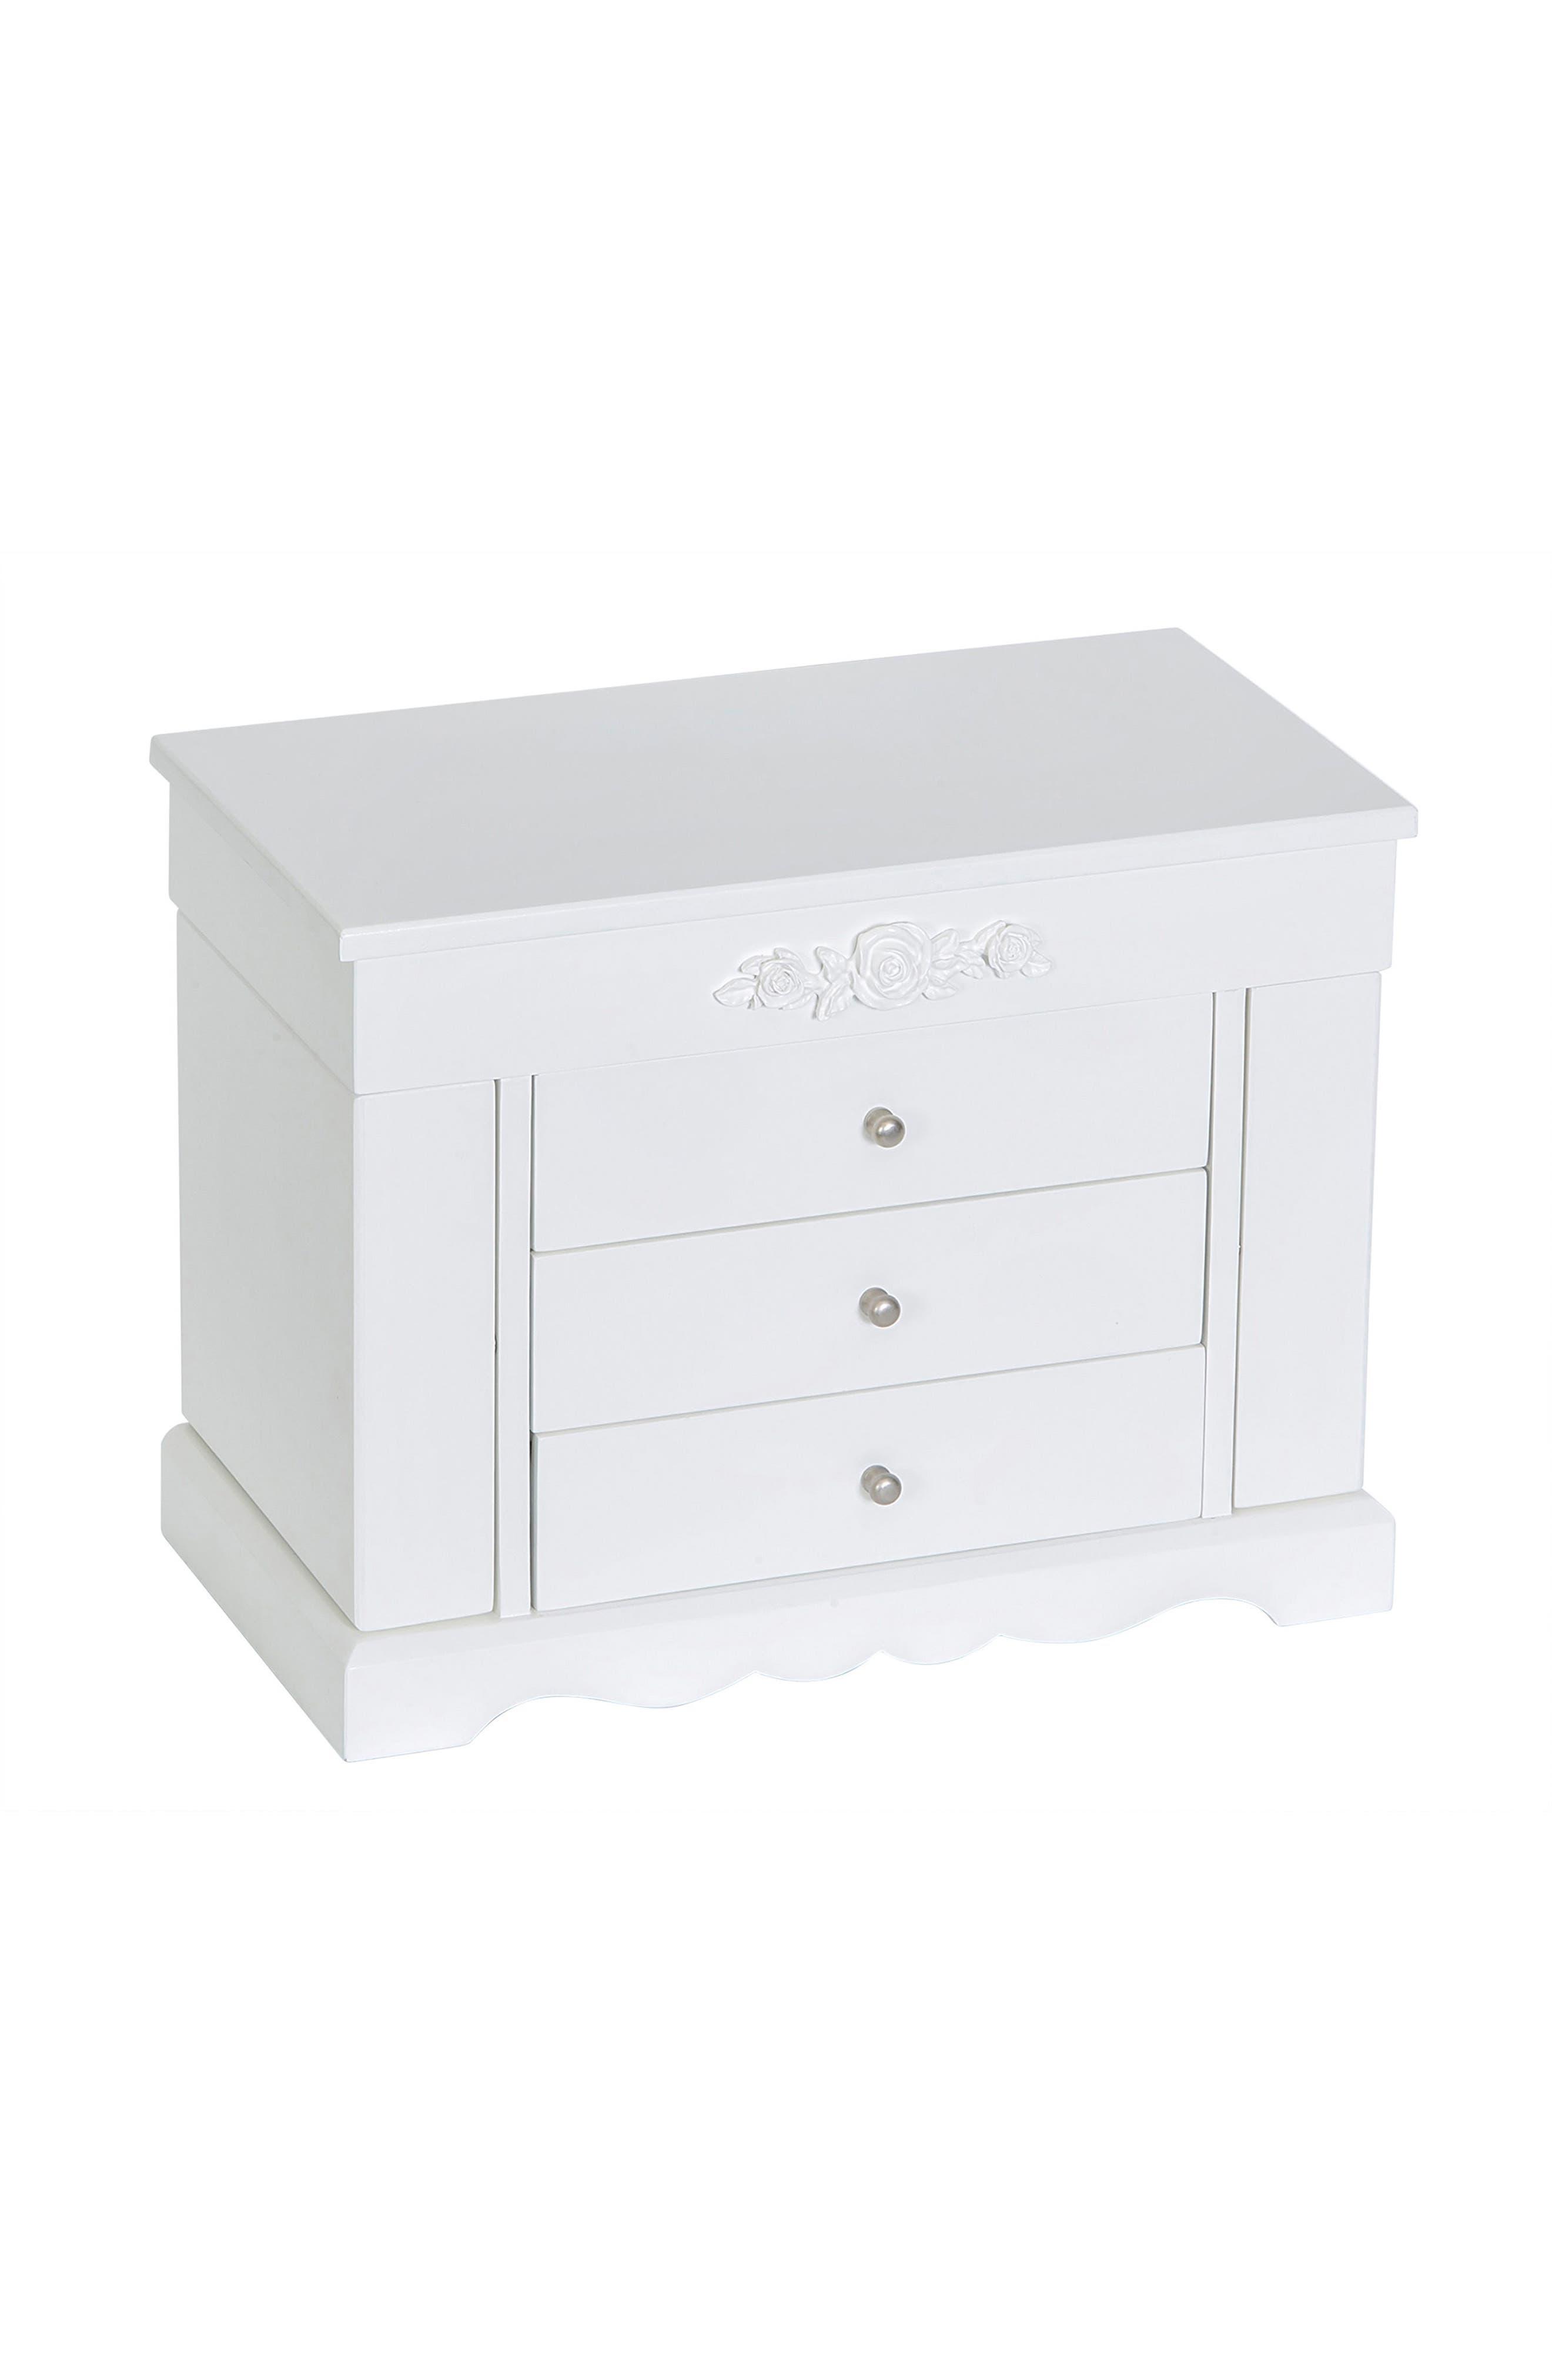 Mele & Co. Montague Jewelry Box